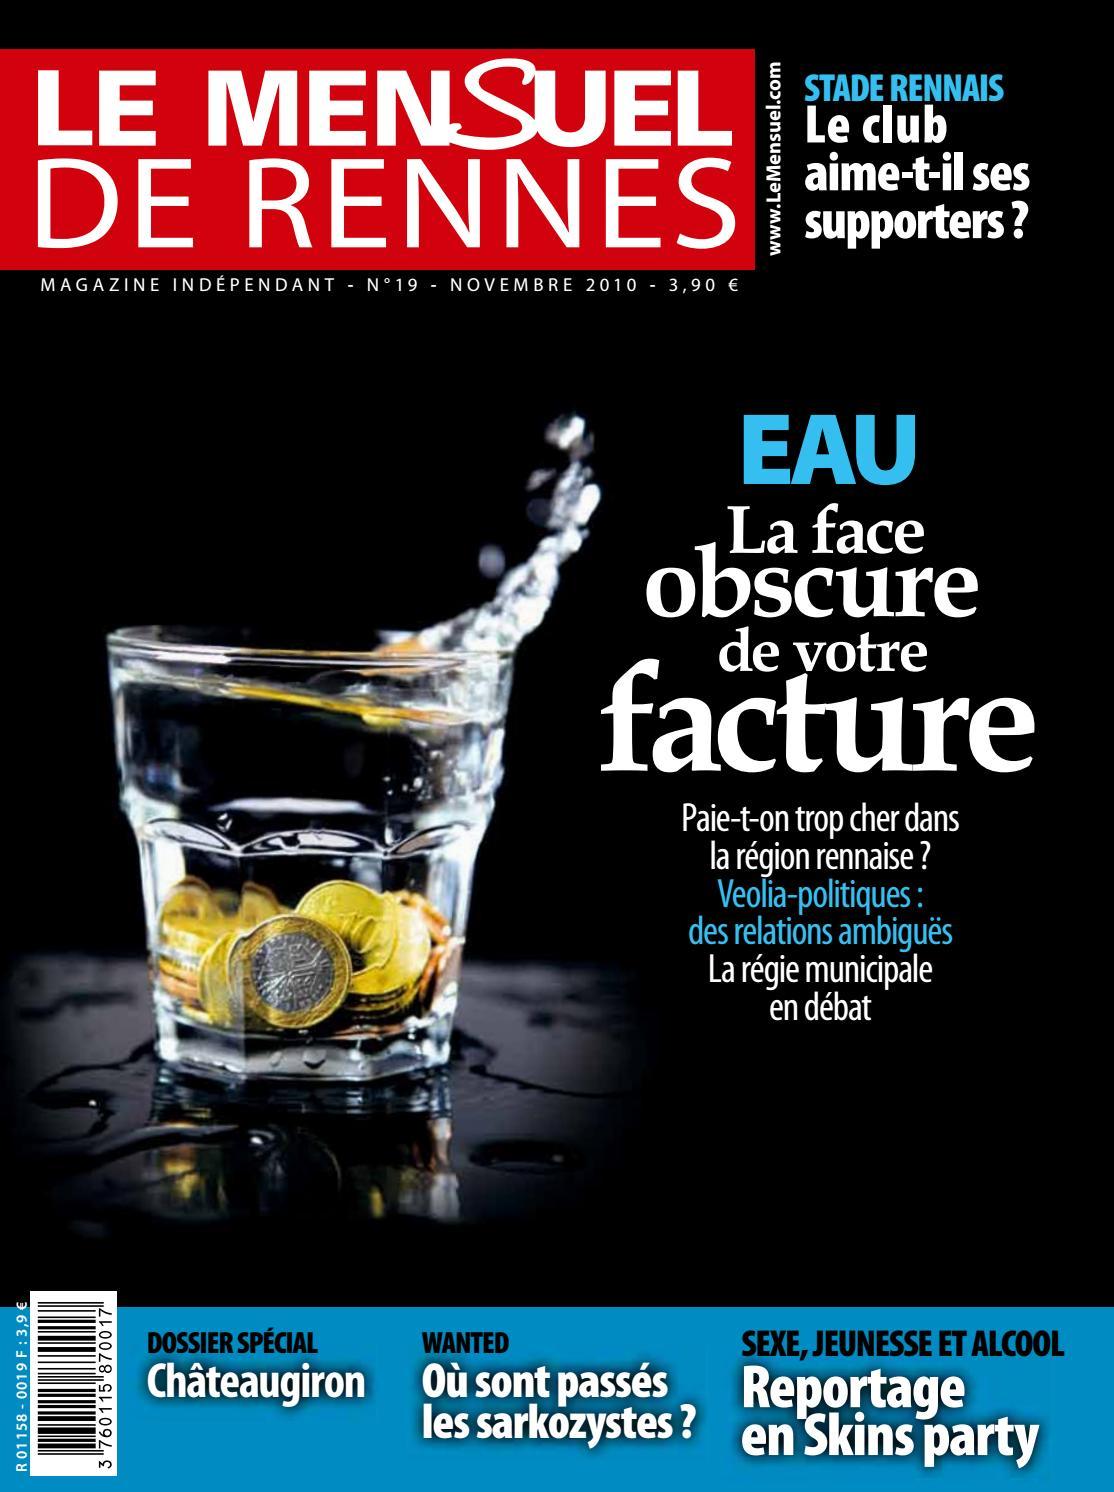 Le mensuel de rennes (29) by Mensuel de Rennes - issuu